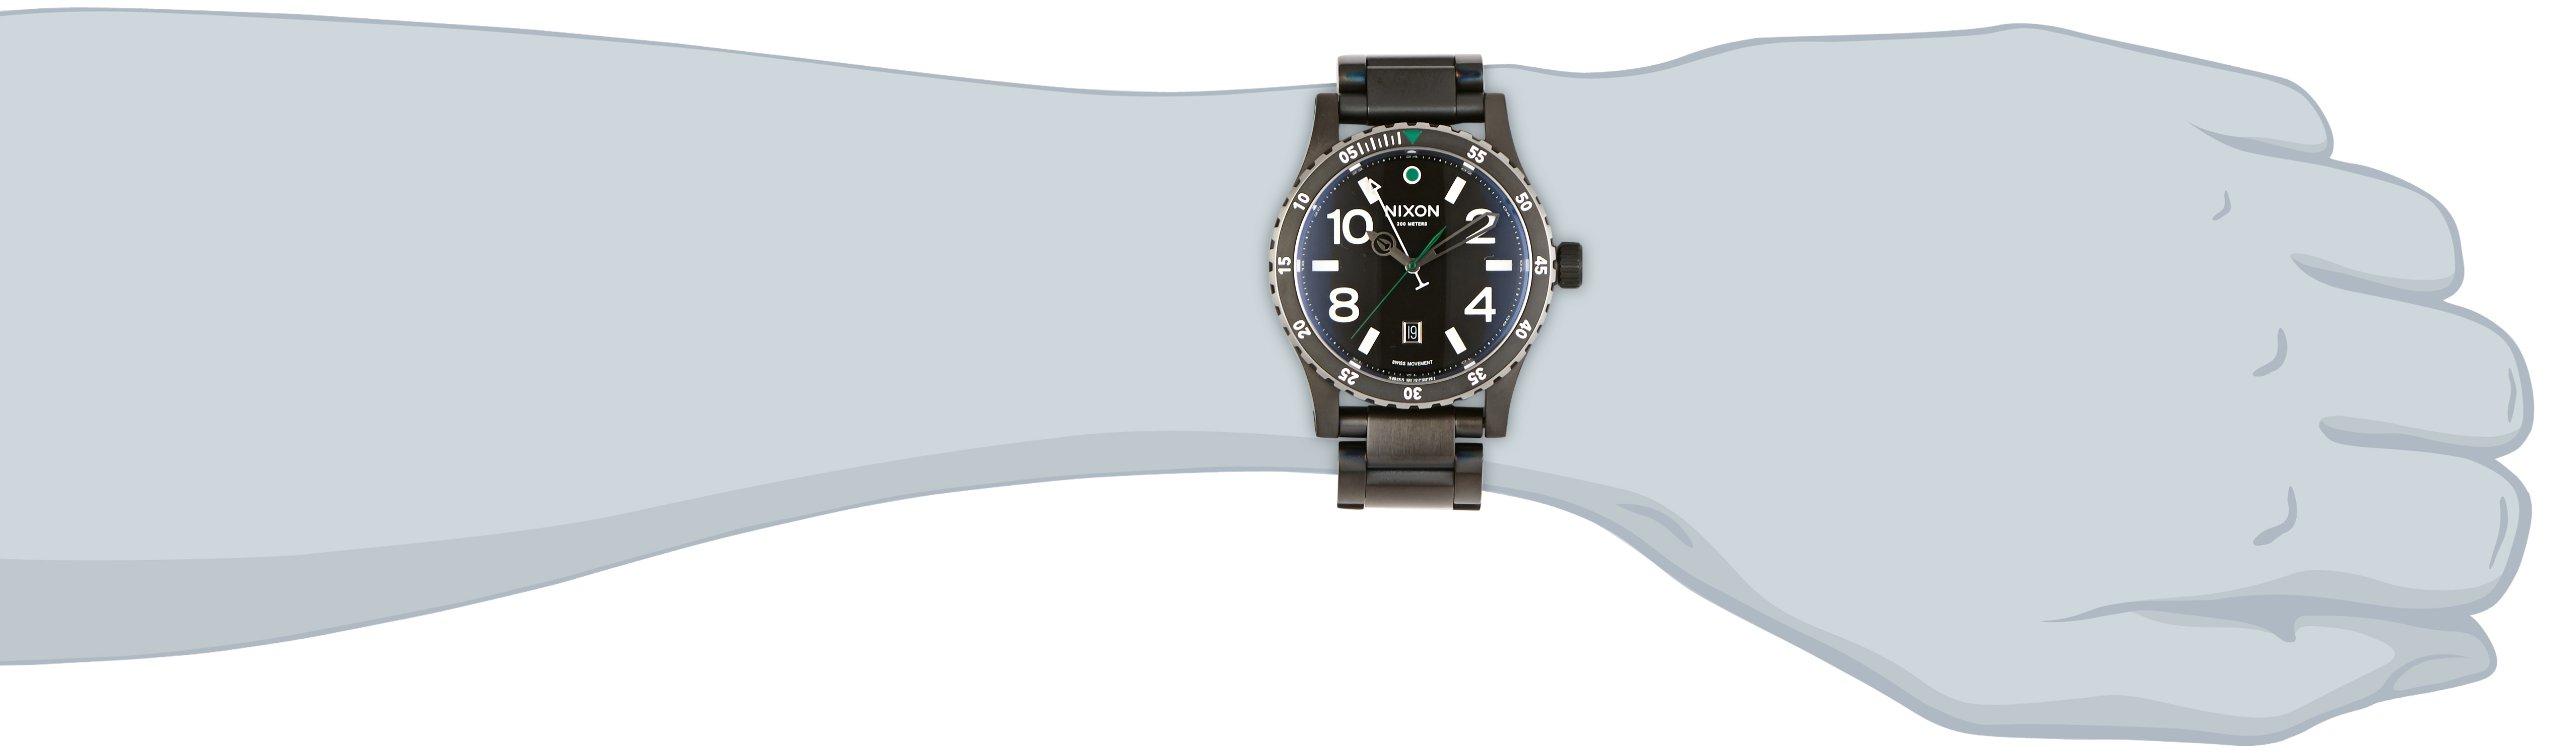 NIXON Men's Quartz Watch with Stainless Steel Strap, Black (Model: A277-1421 by NIXON